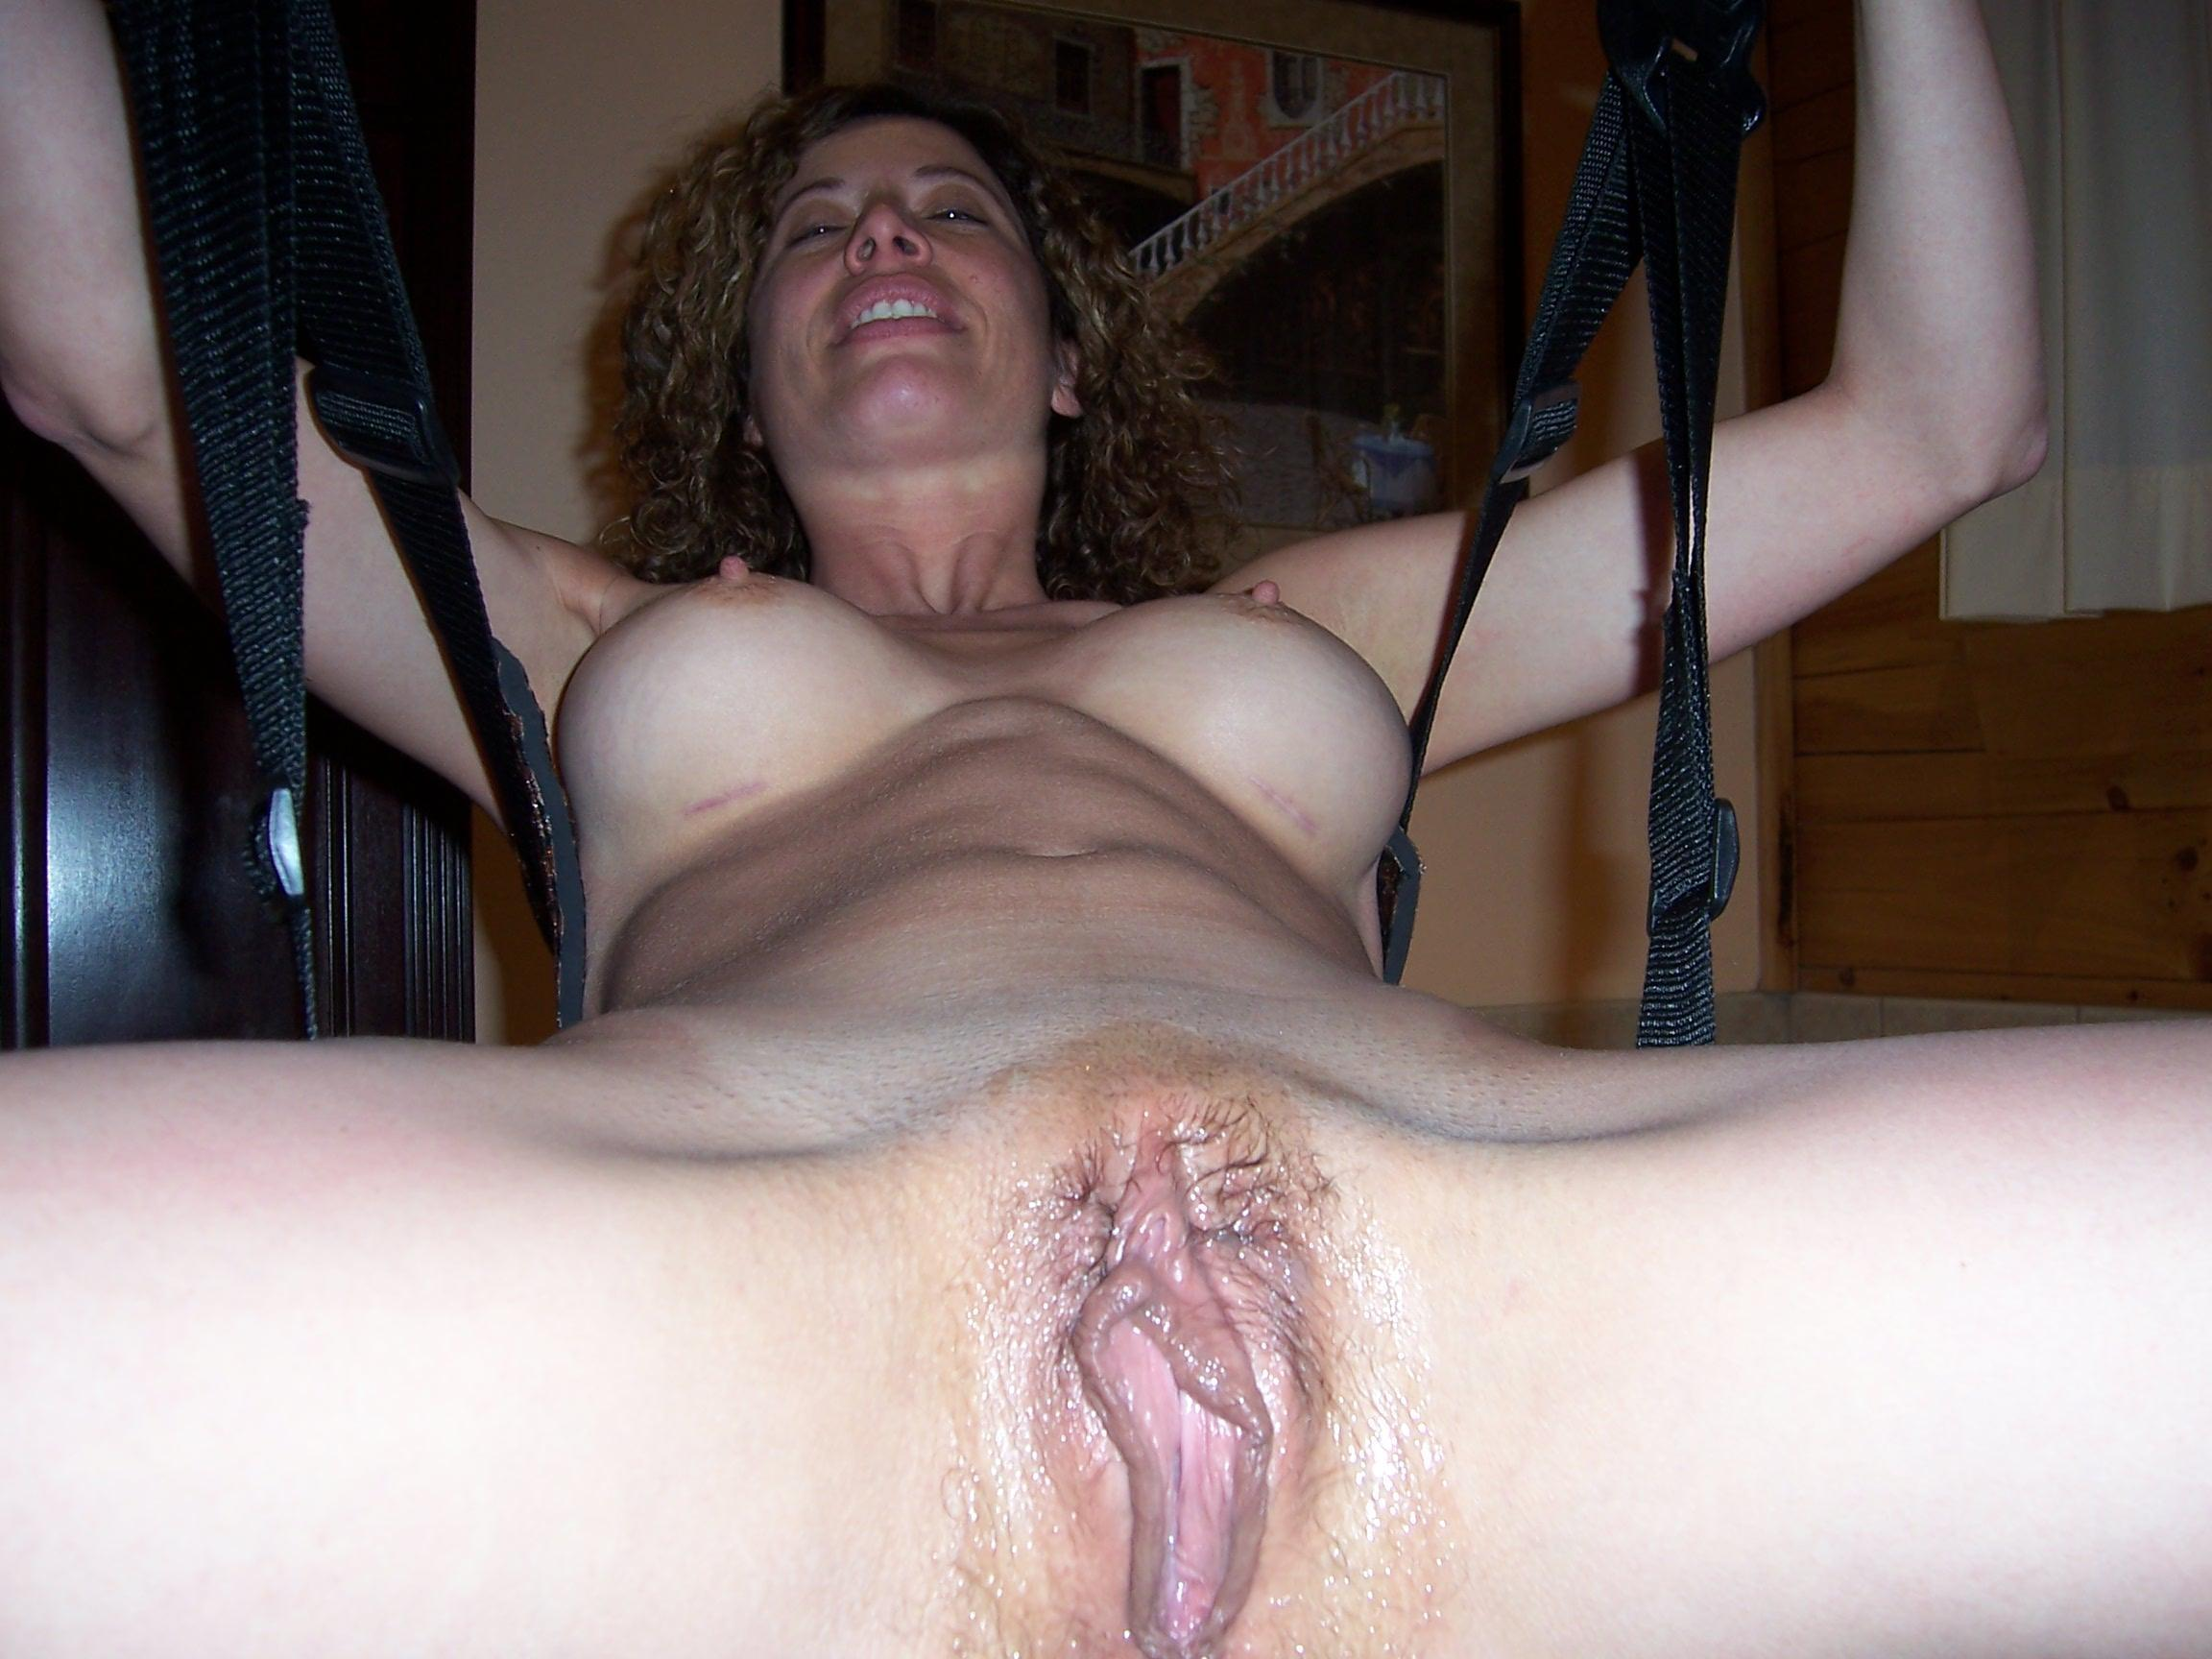 Jennifer Lopez Desnuda jlo xxx video porno y fotos sexuales